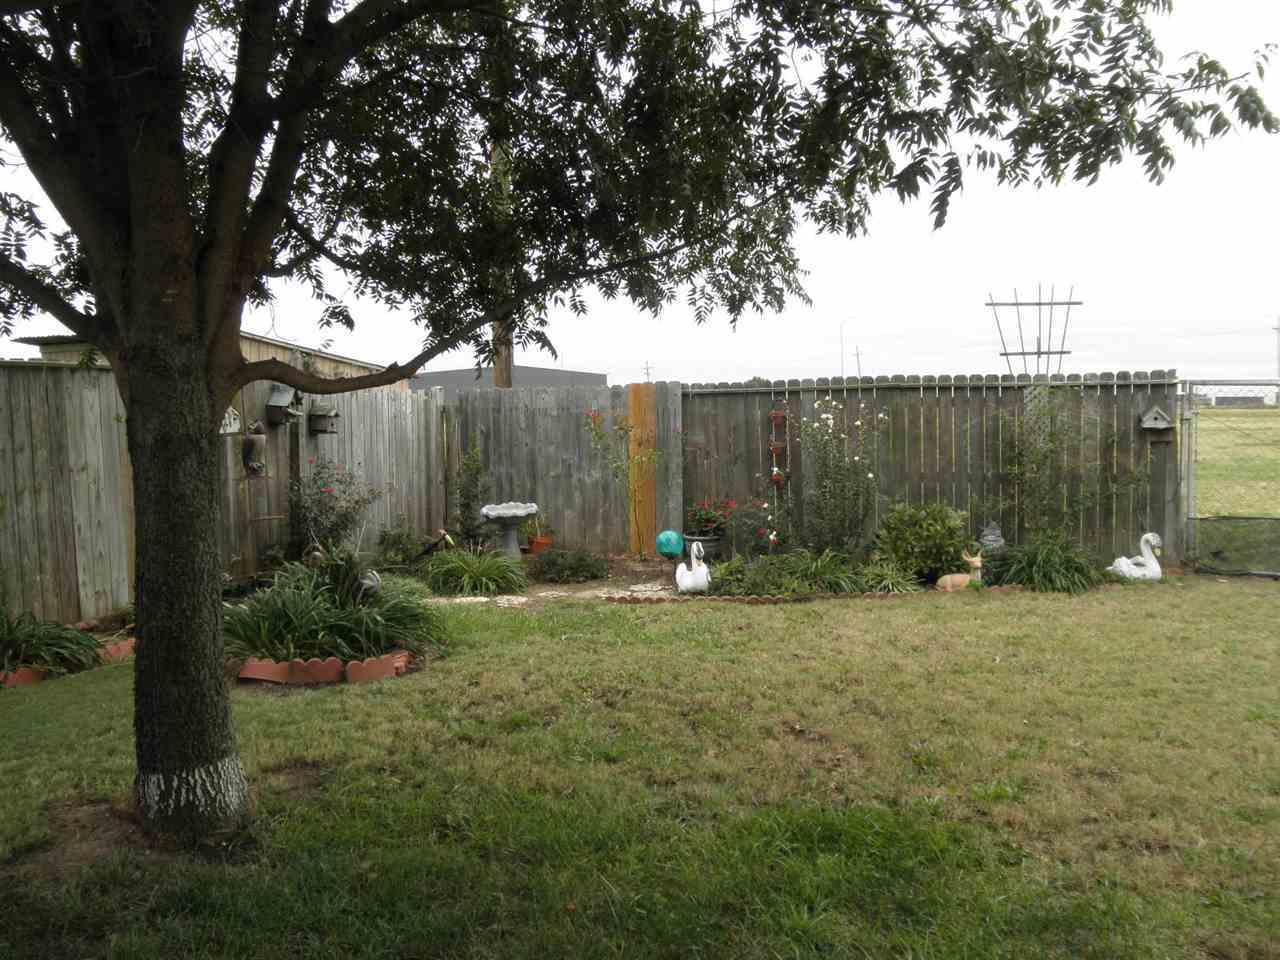 Sold Cross Sale W/ MLS | 2516 Oriole  Ponca City, OK 74601 29